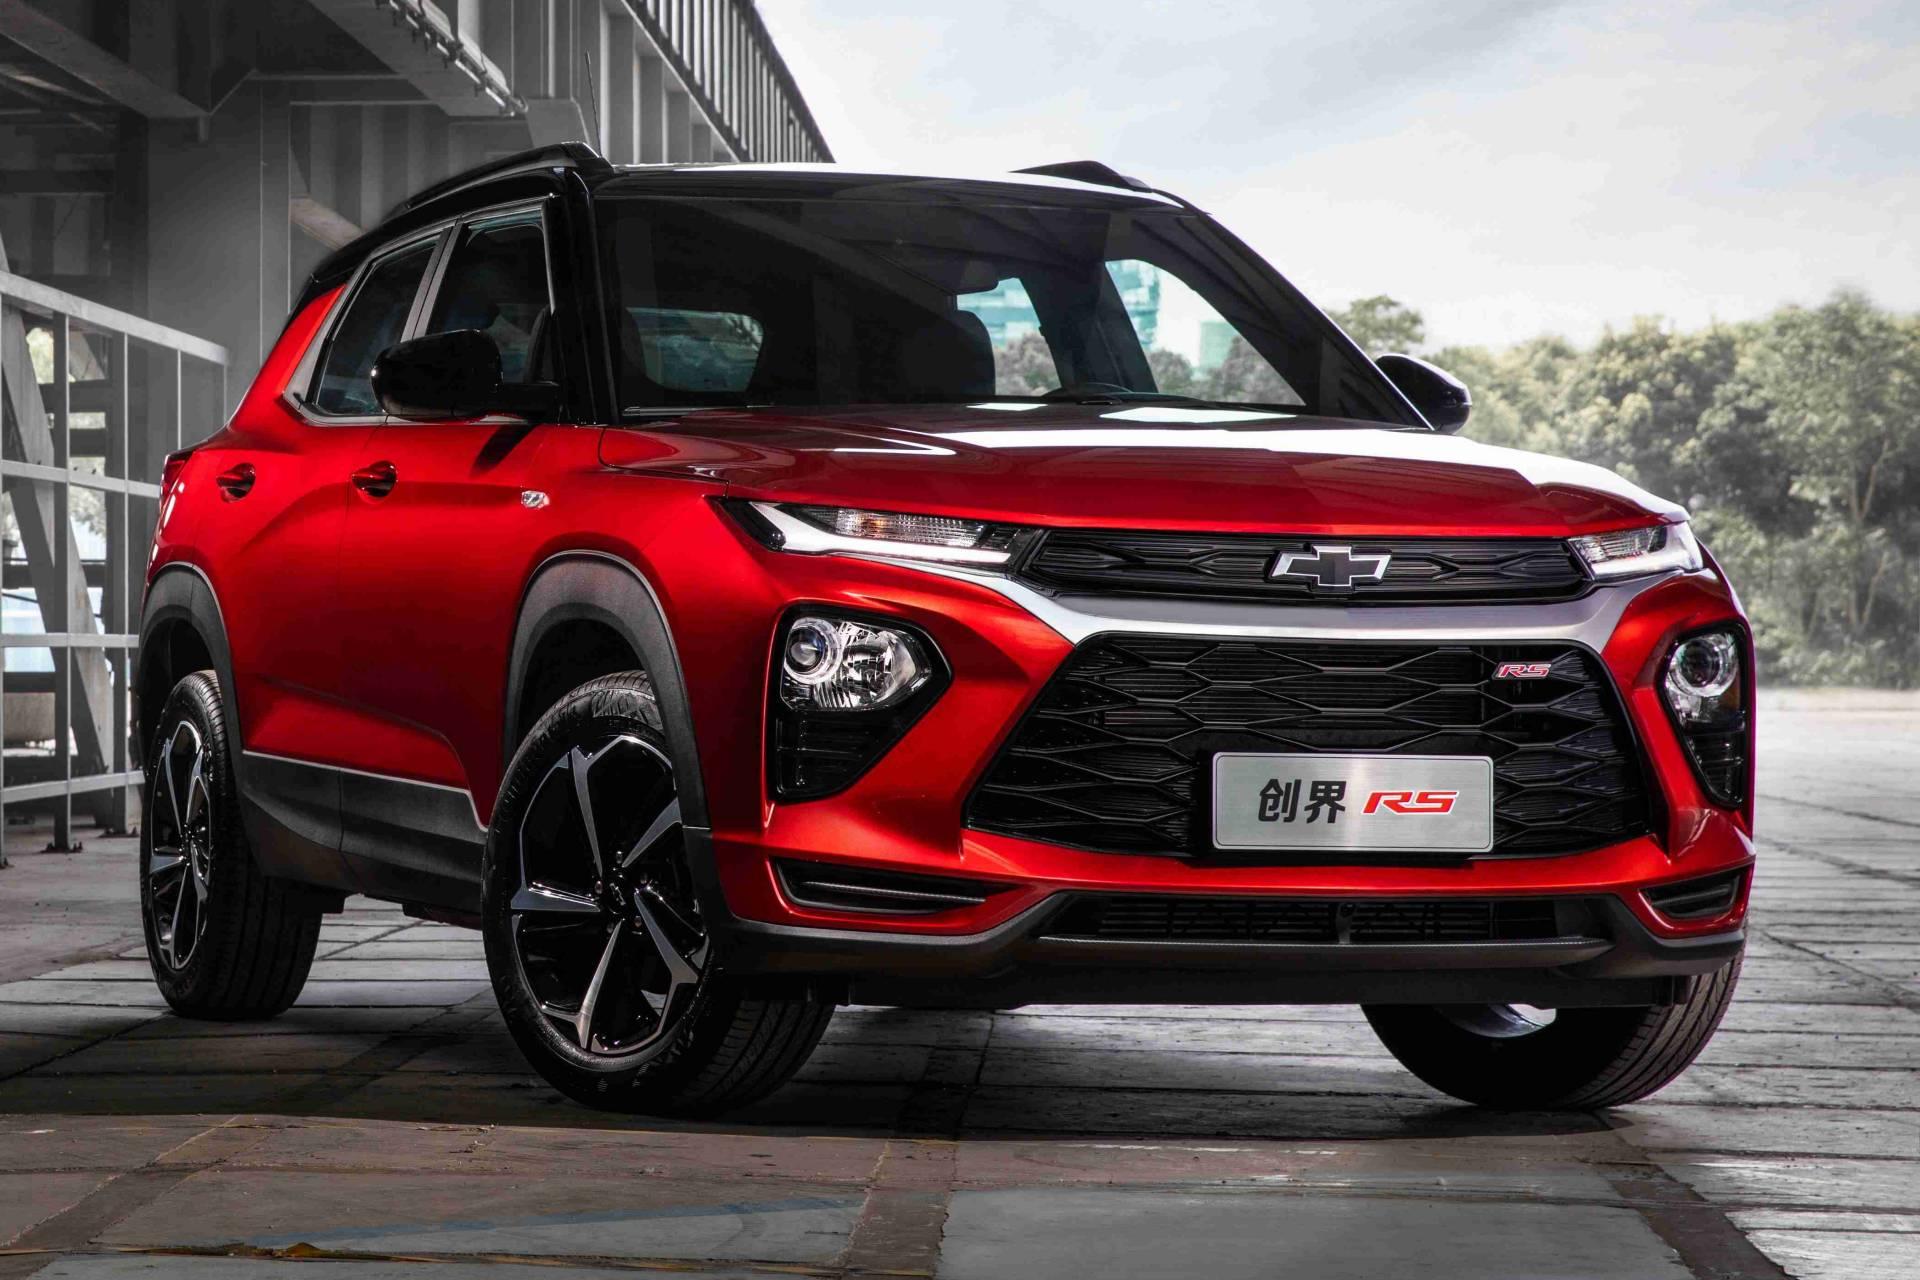 2020 Chevrolet Trailblazer Return And Release Date >> Chevrolet Trailblazer Returns For 2020 With Three Cylinder